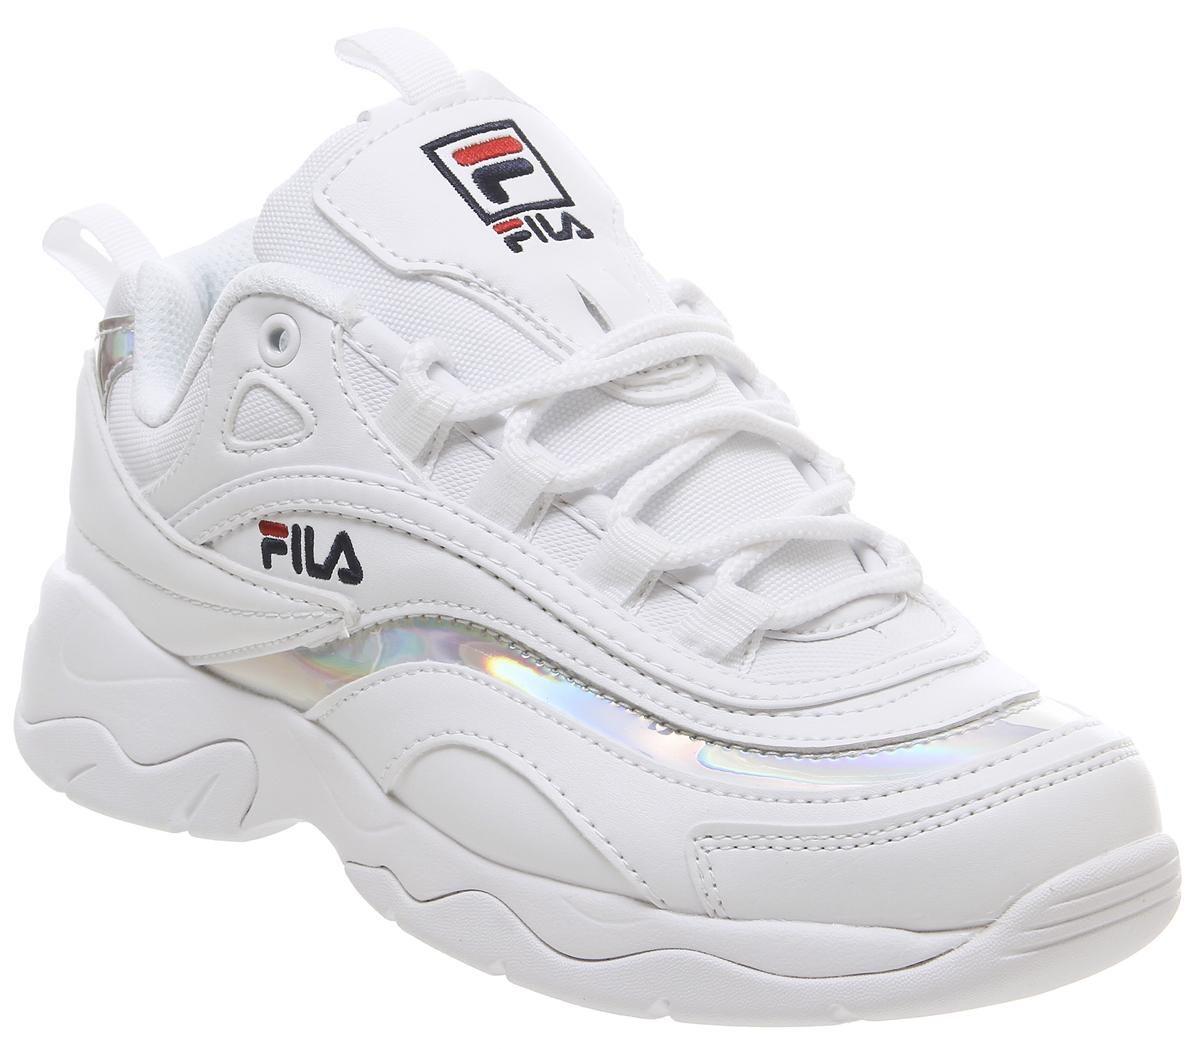 Fila Fila Ray Trainers White